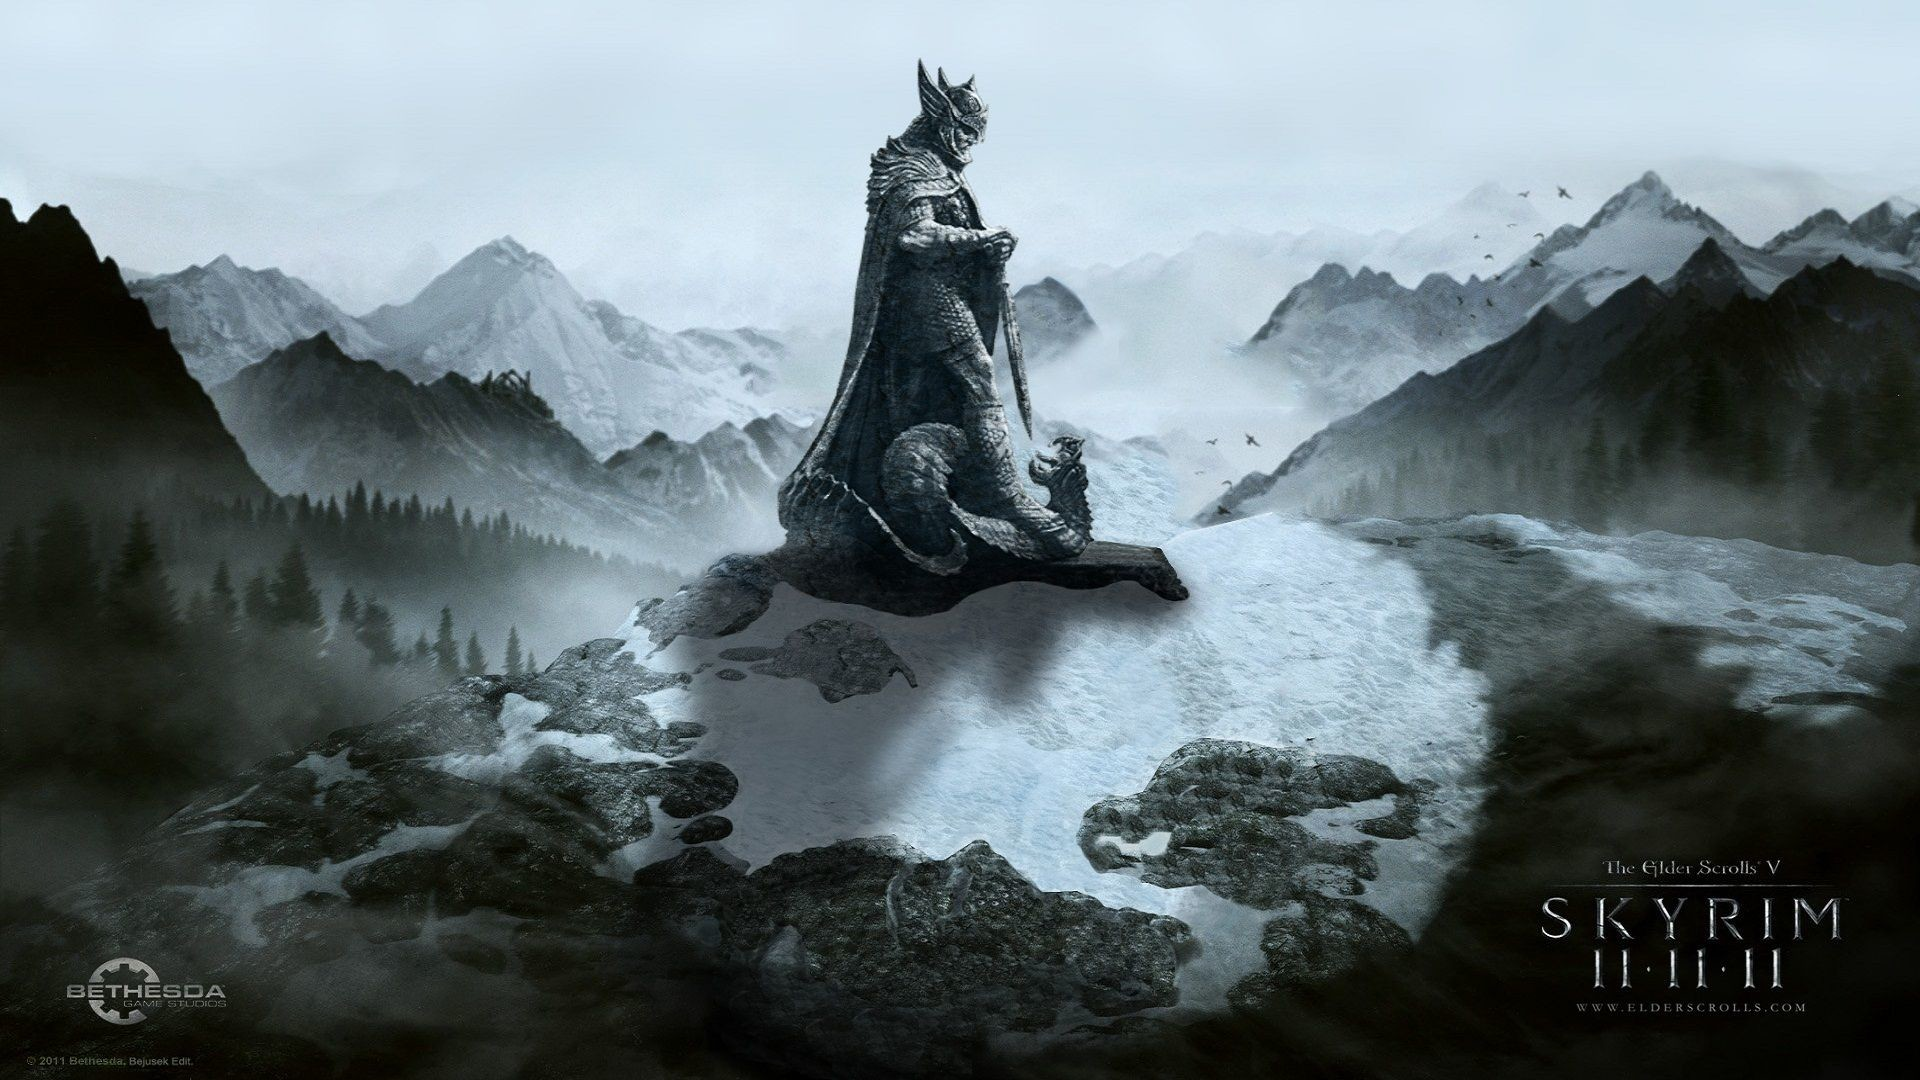 The Elder Scrolls V: Skyrim HD Wallpapers